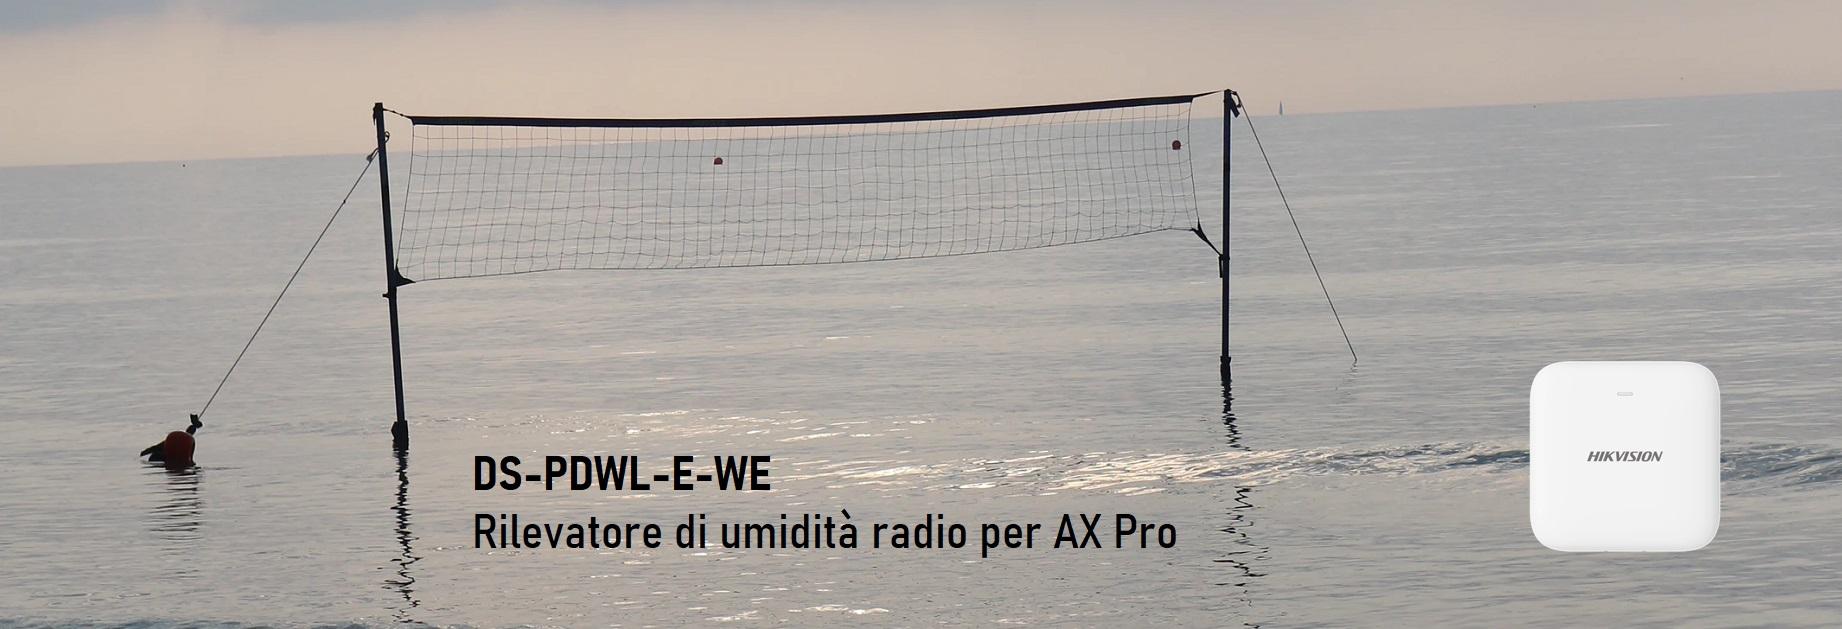 DS-PDWL-E-WE Rilevatore di perdite d'acqua radio per AX Pro